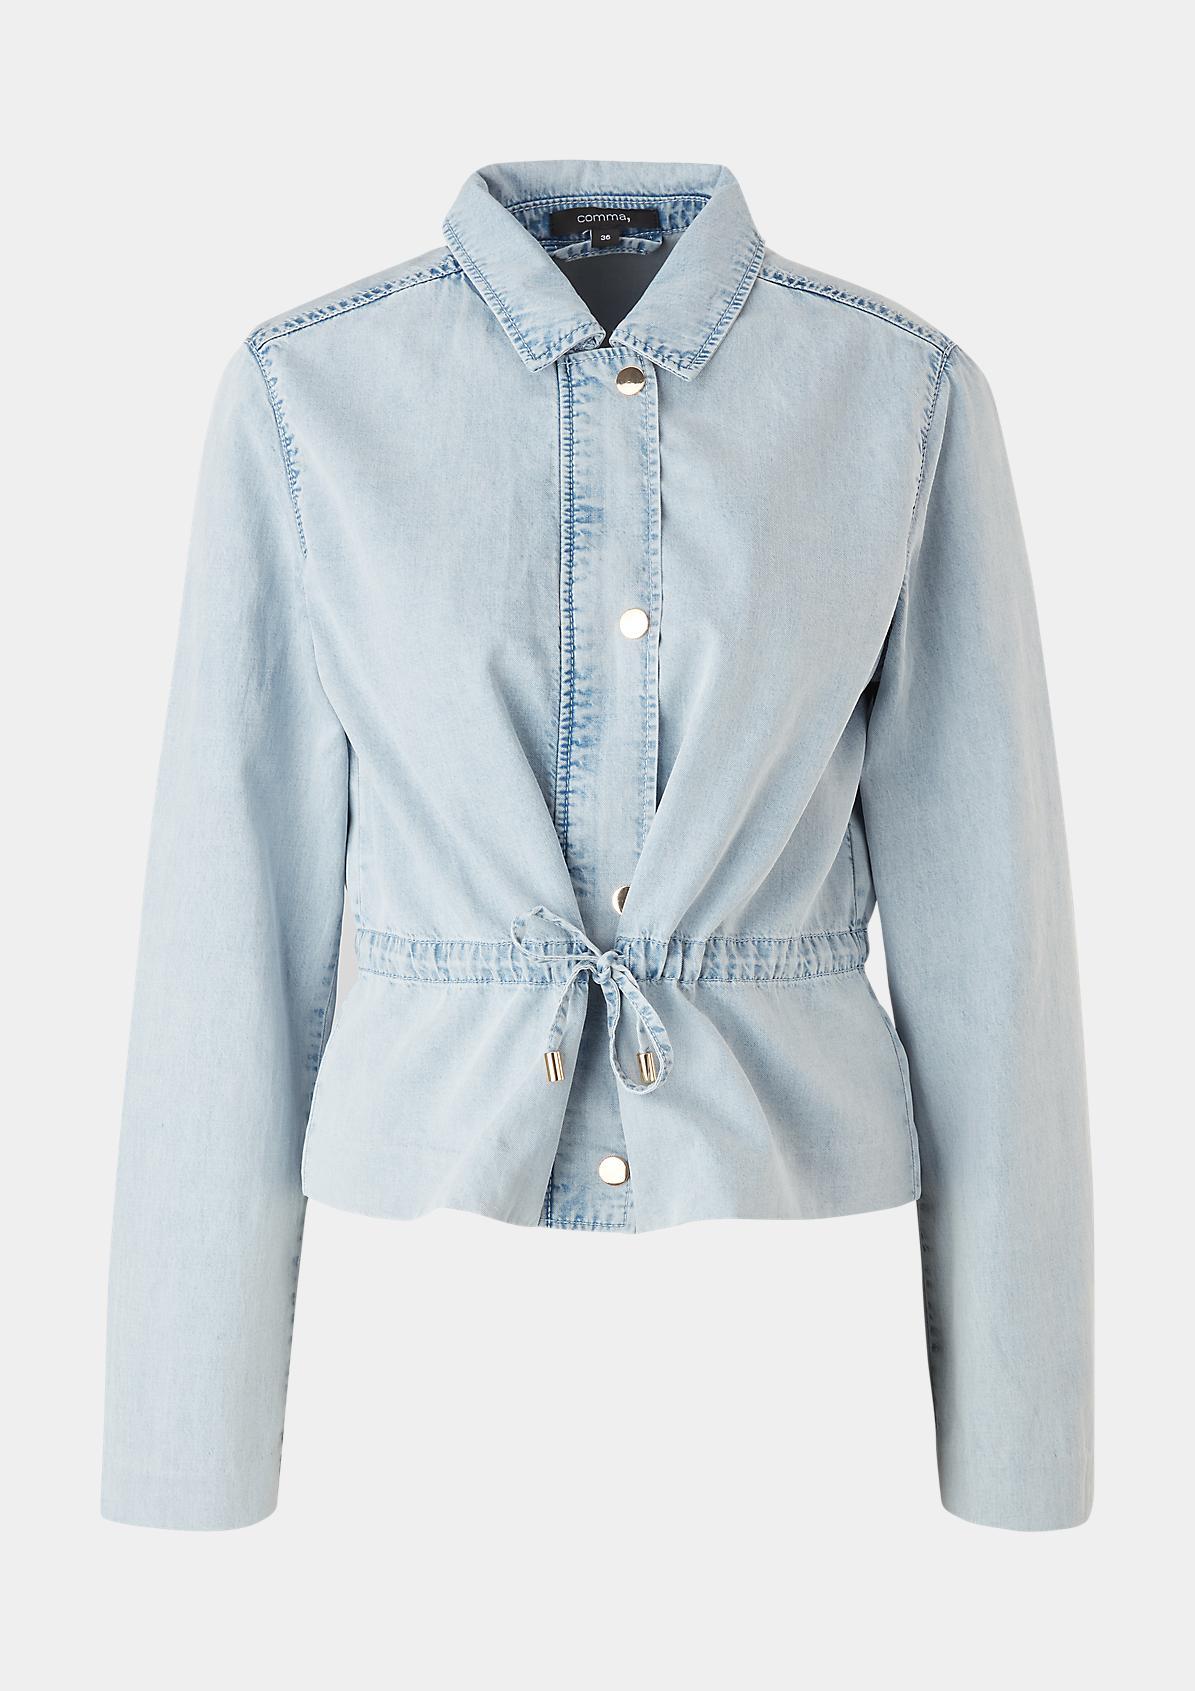 Blusenjacke aus Lyocell-Denim